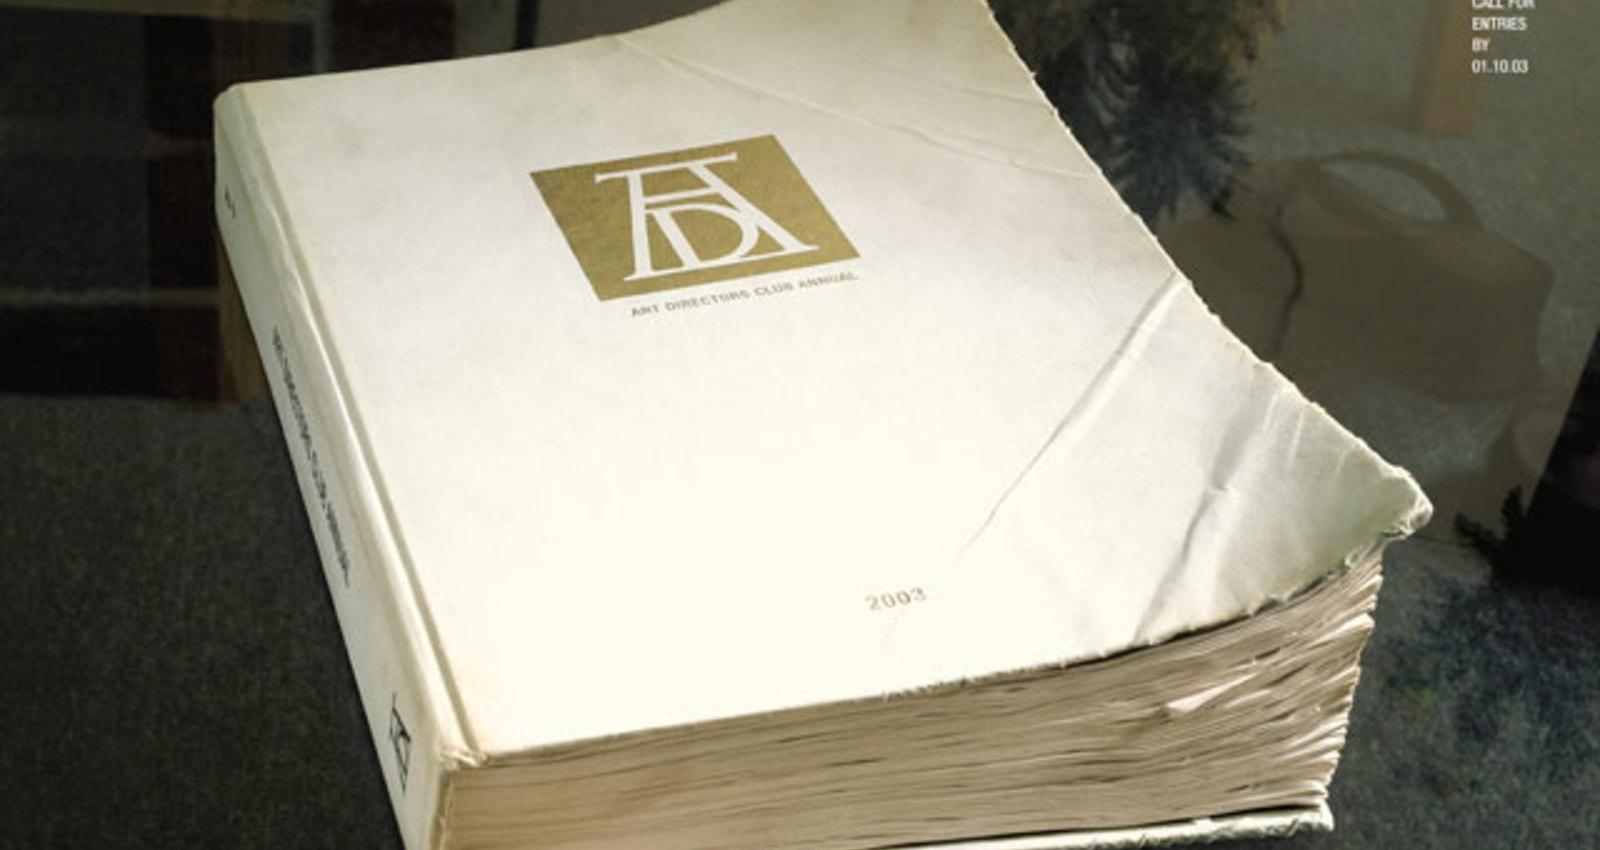 Dusty Bookshelf, Packing Materials, Splayed Book